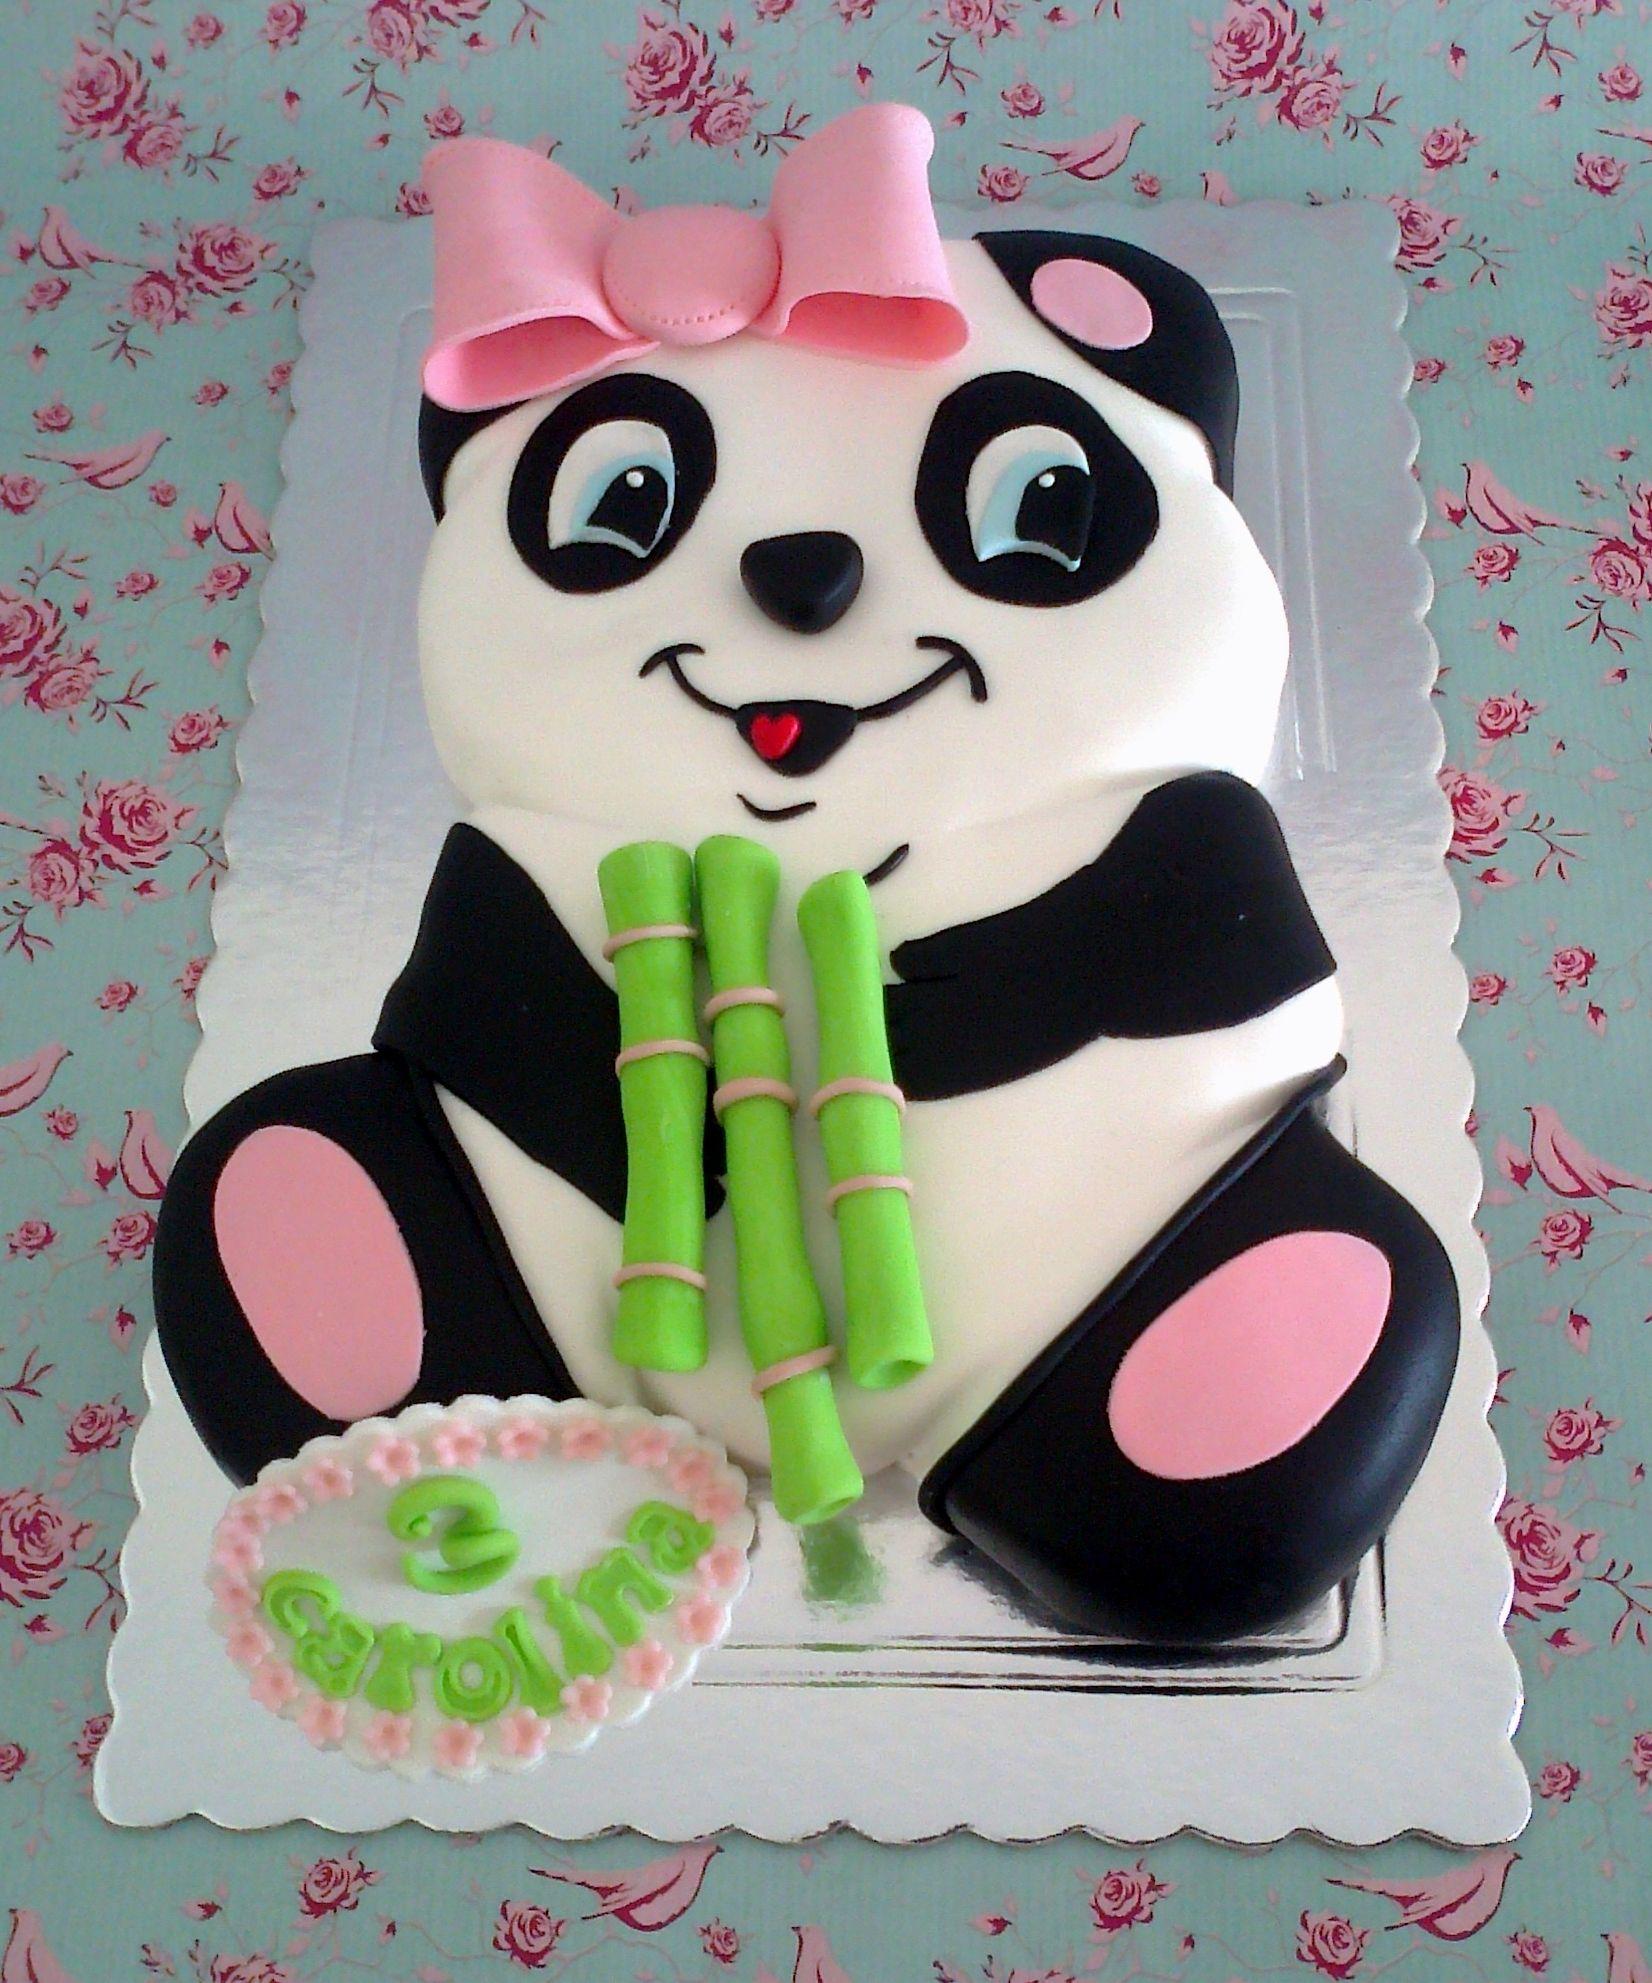 Panda Birthday Cake To Cute Ba Pinterest Cakes And